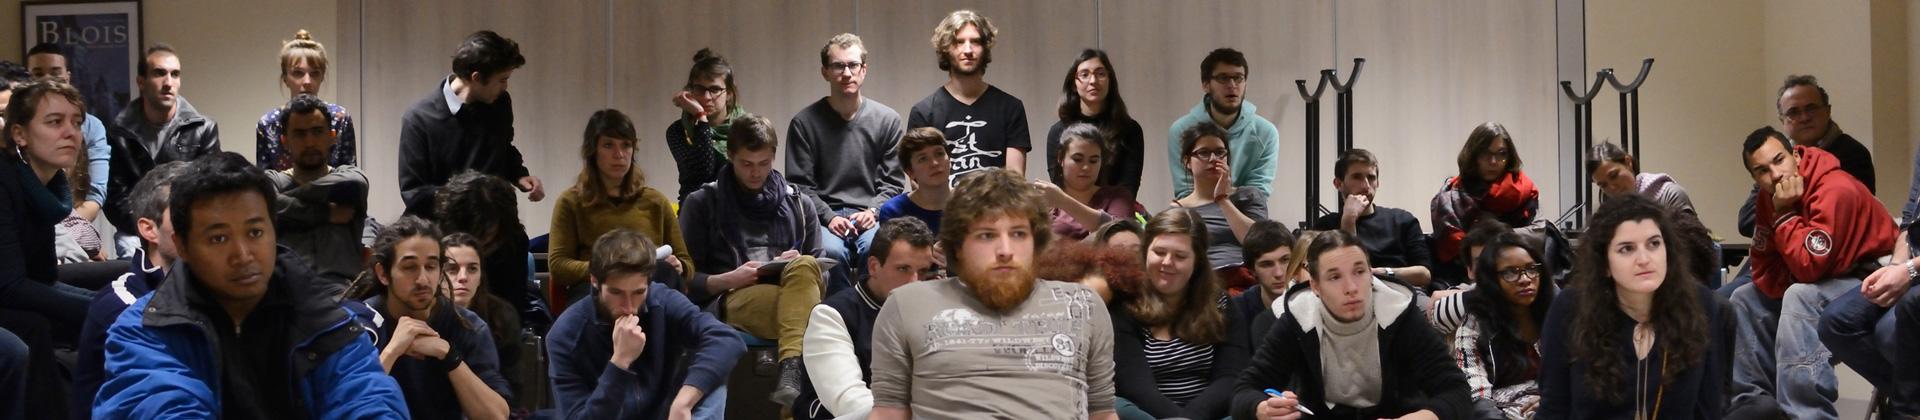 Dynamiques Collectives